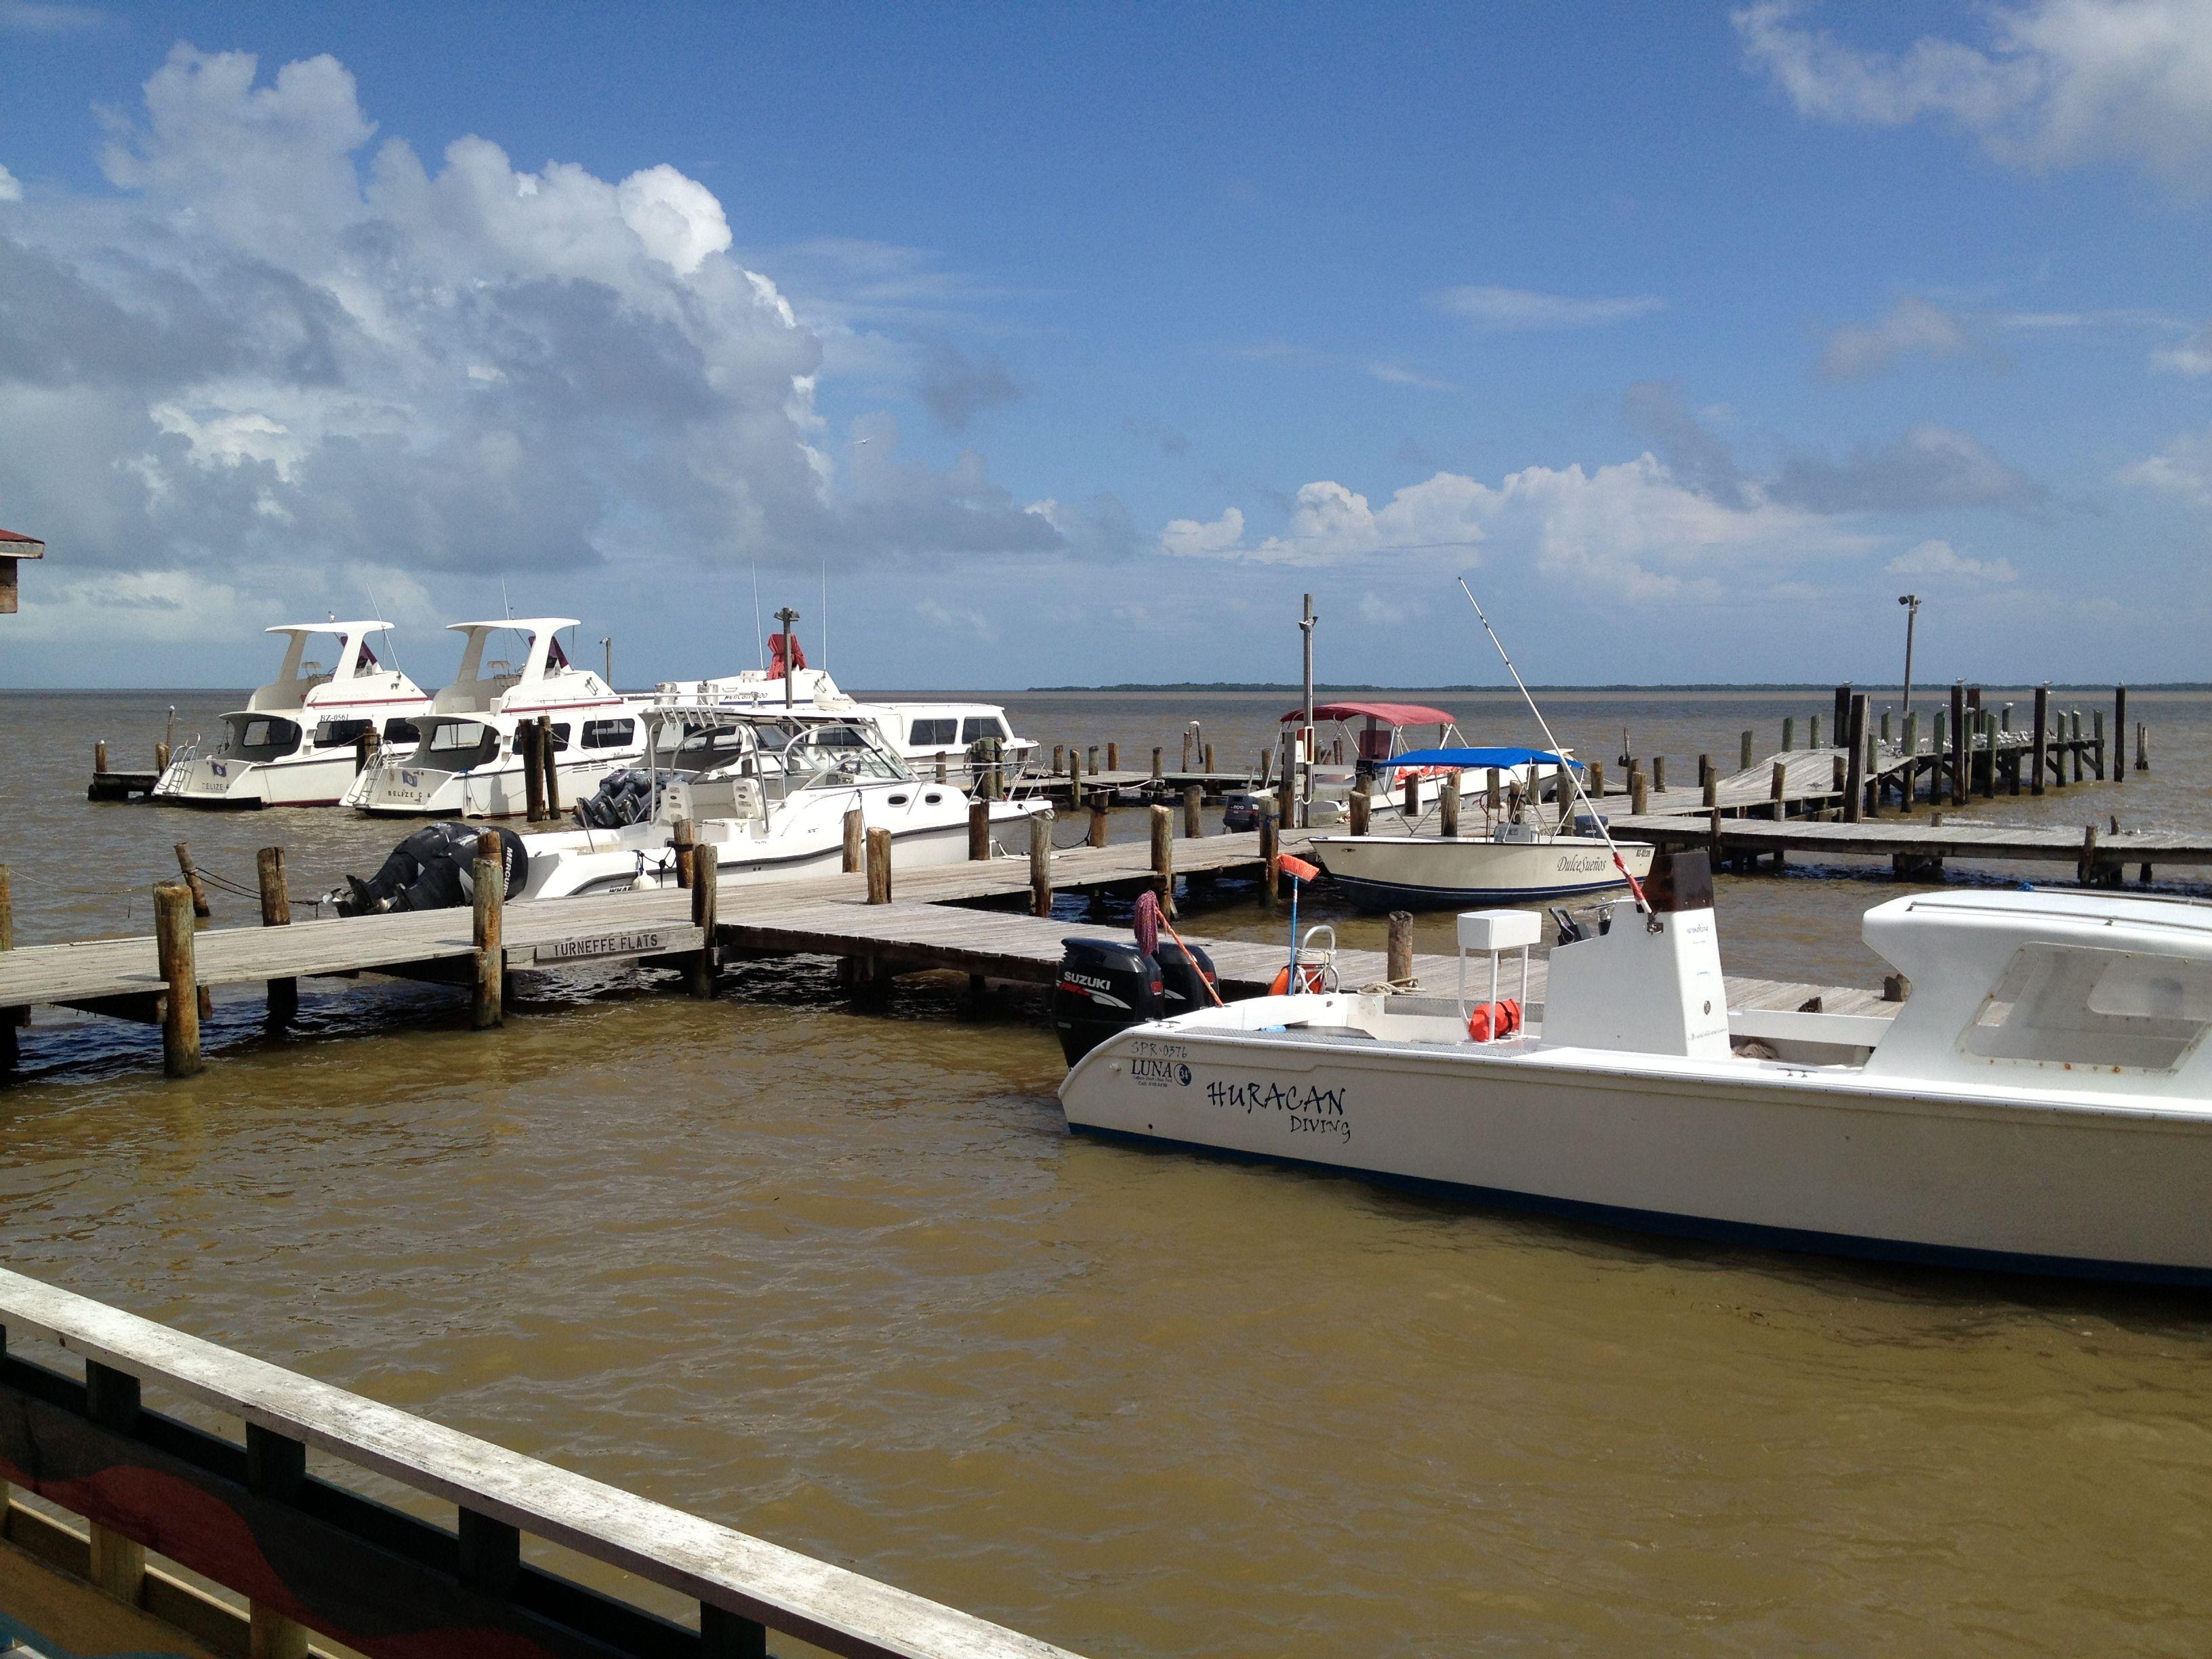 Boats for hire transport at princess marina they take